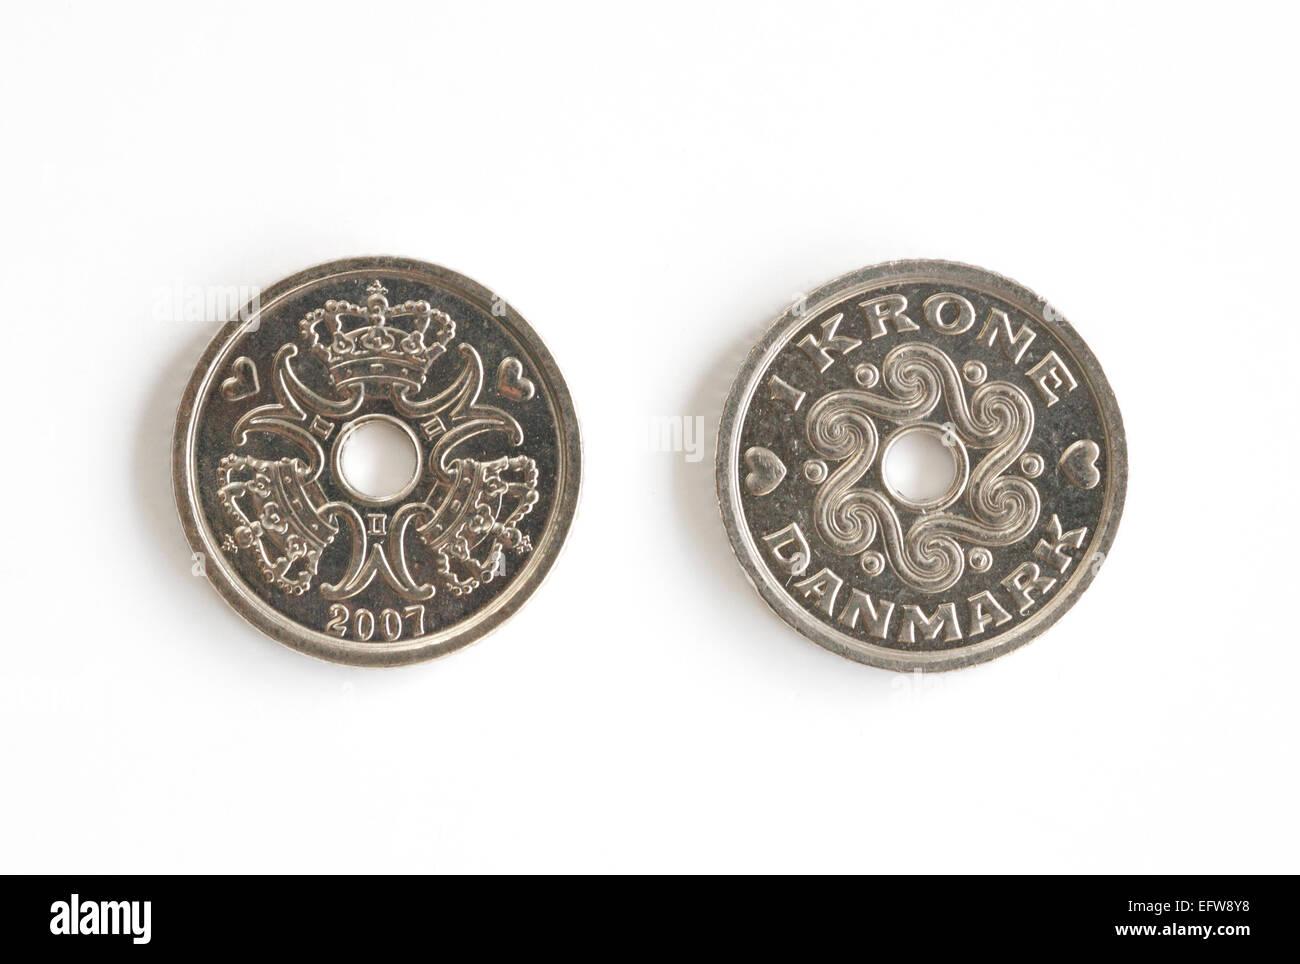 Dos Coronas danés piezas sobre un fondo blanco. Foto de stock